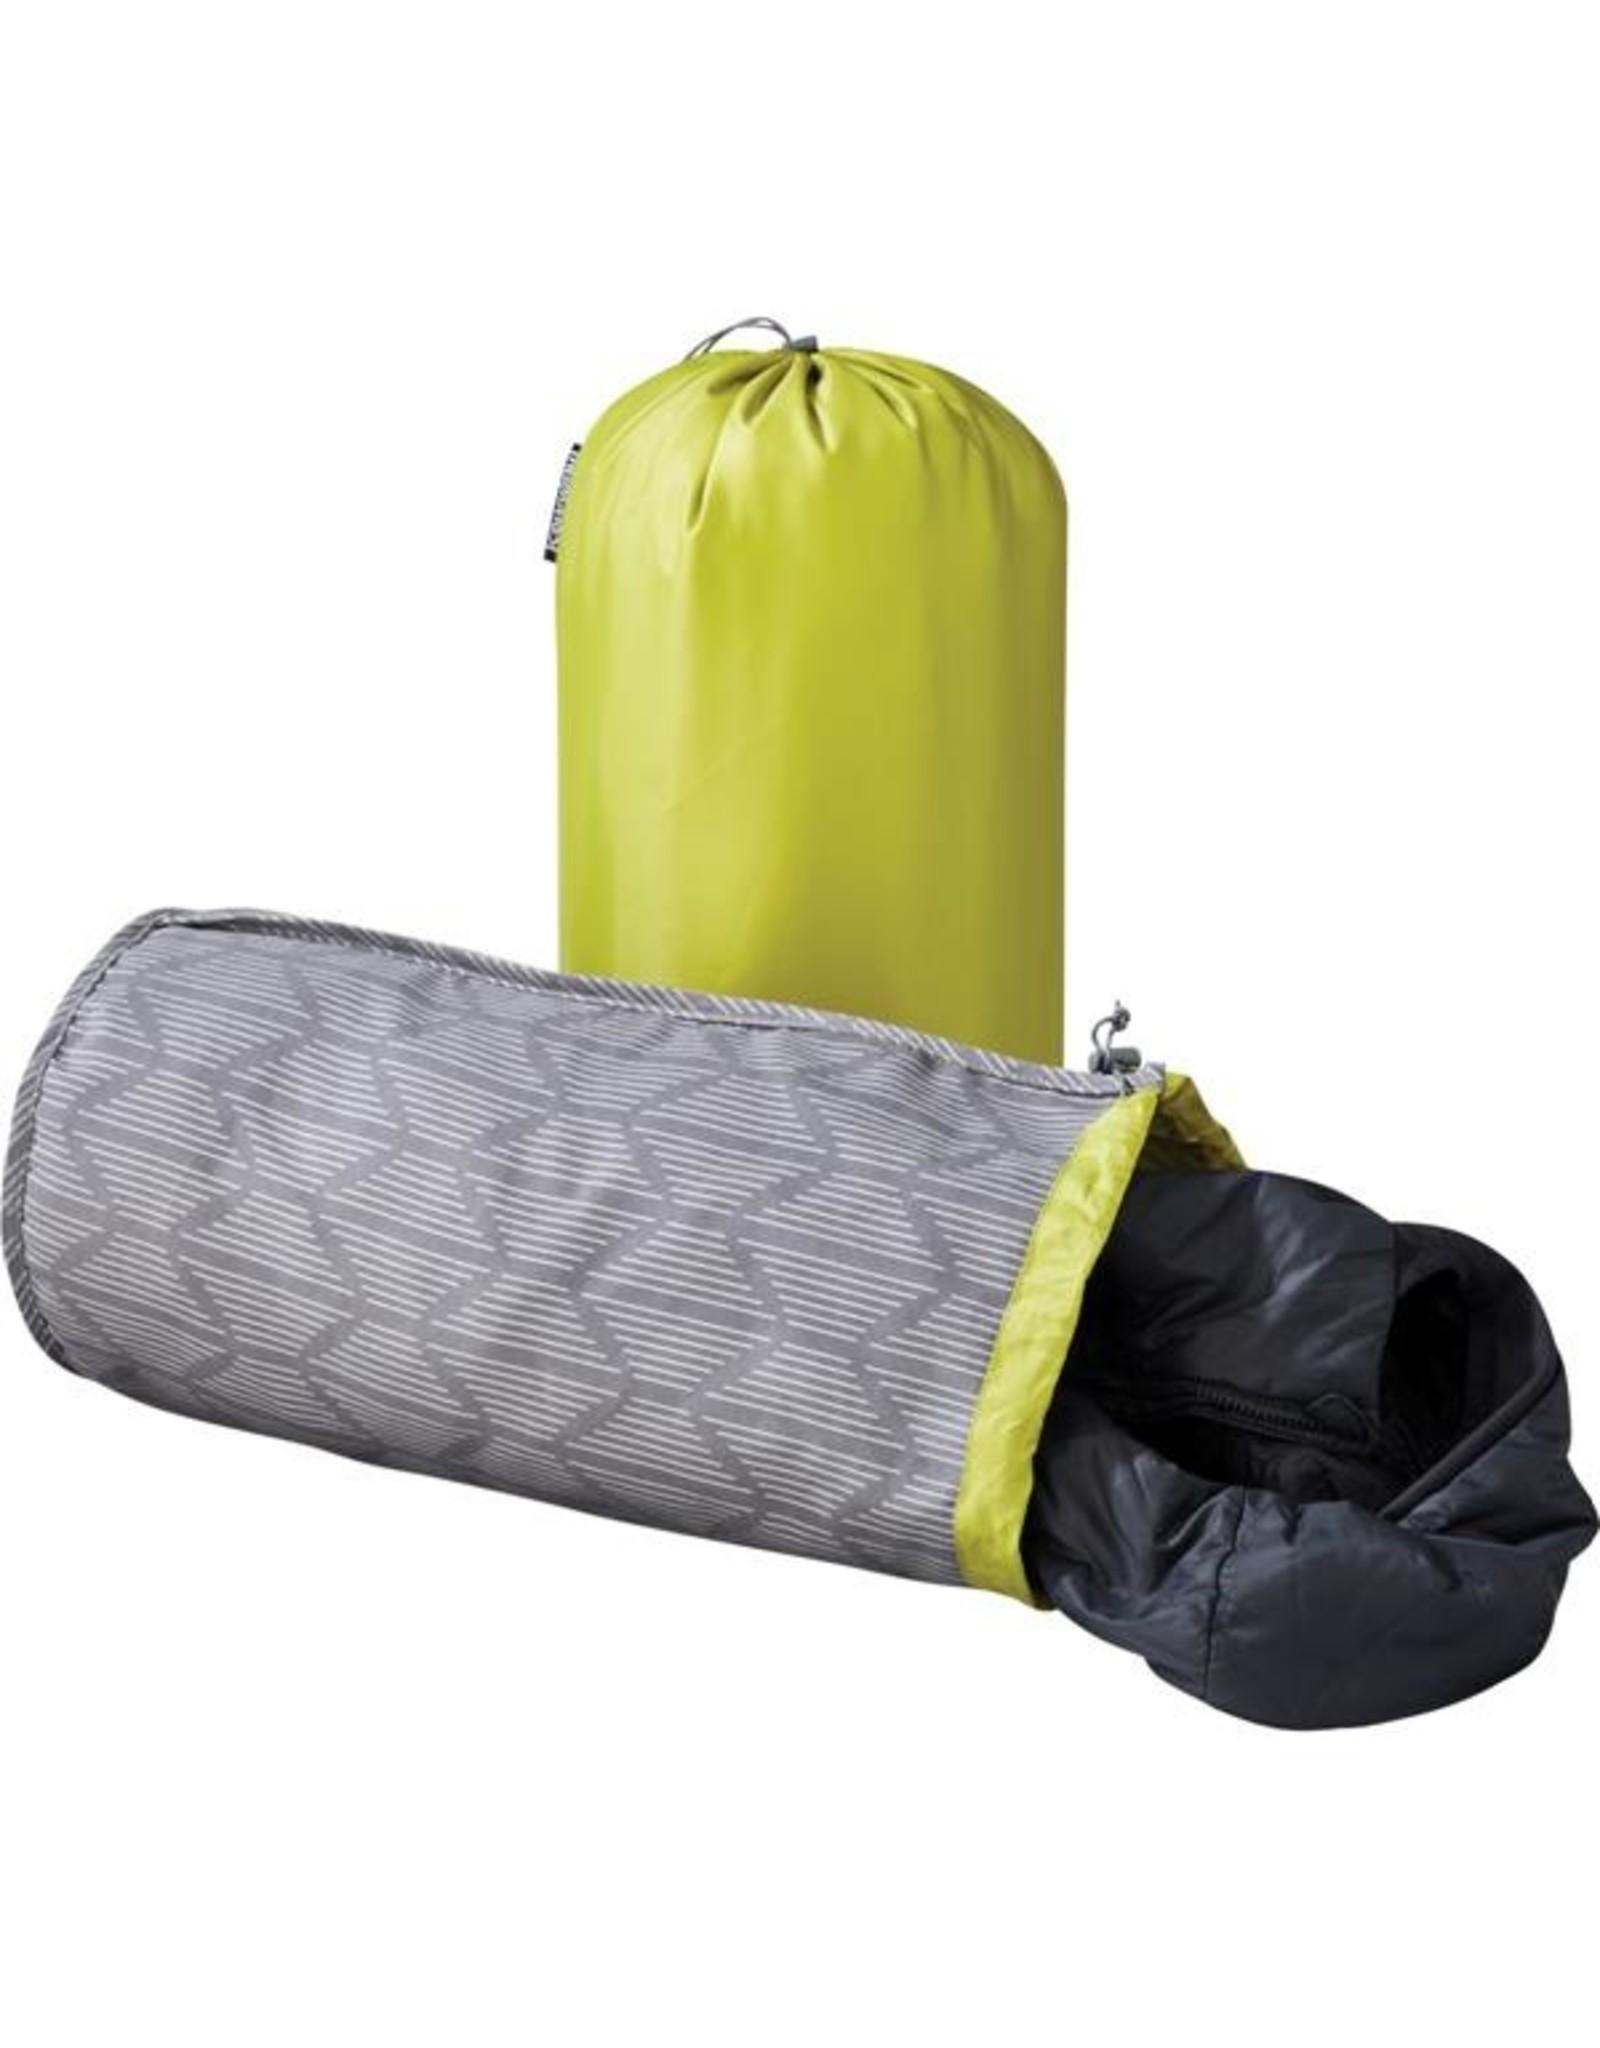 Therm-a-Rest Therm-a-Rest Stuff Sack Pillow Case